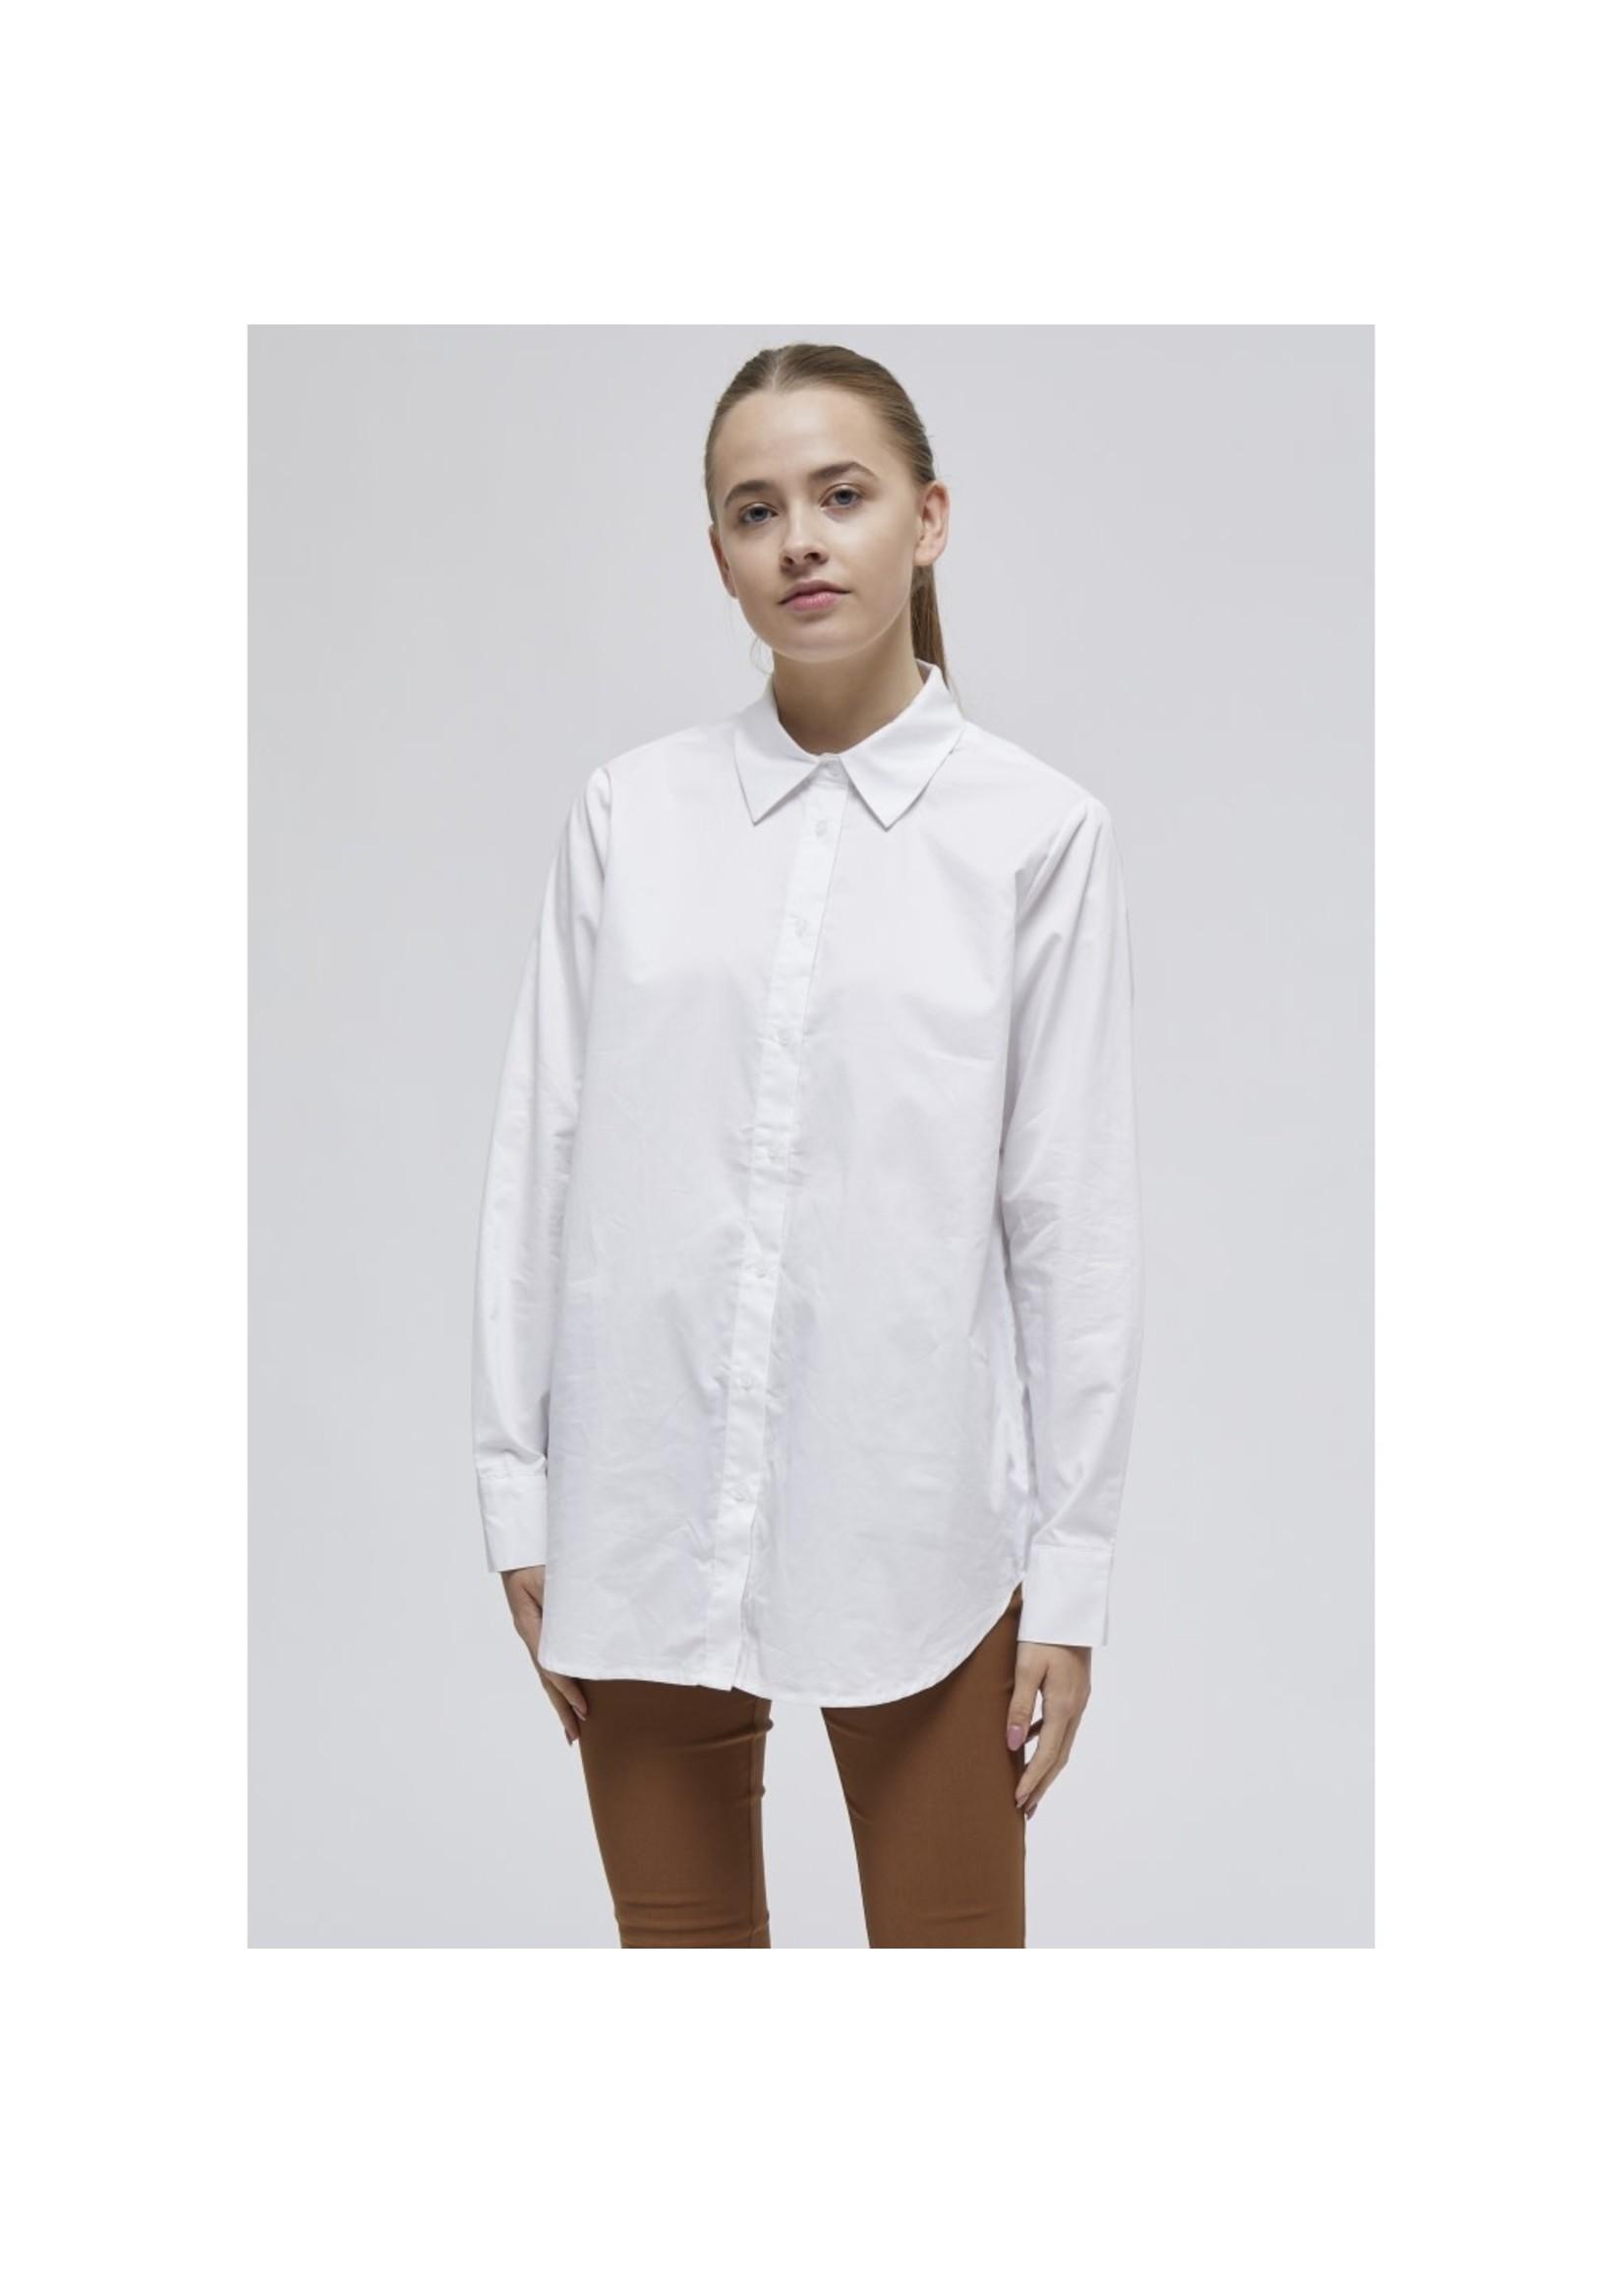 MINUS Vaia oversize shirt wit